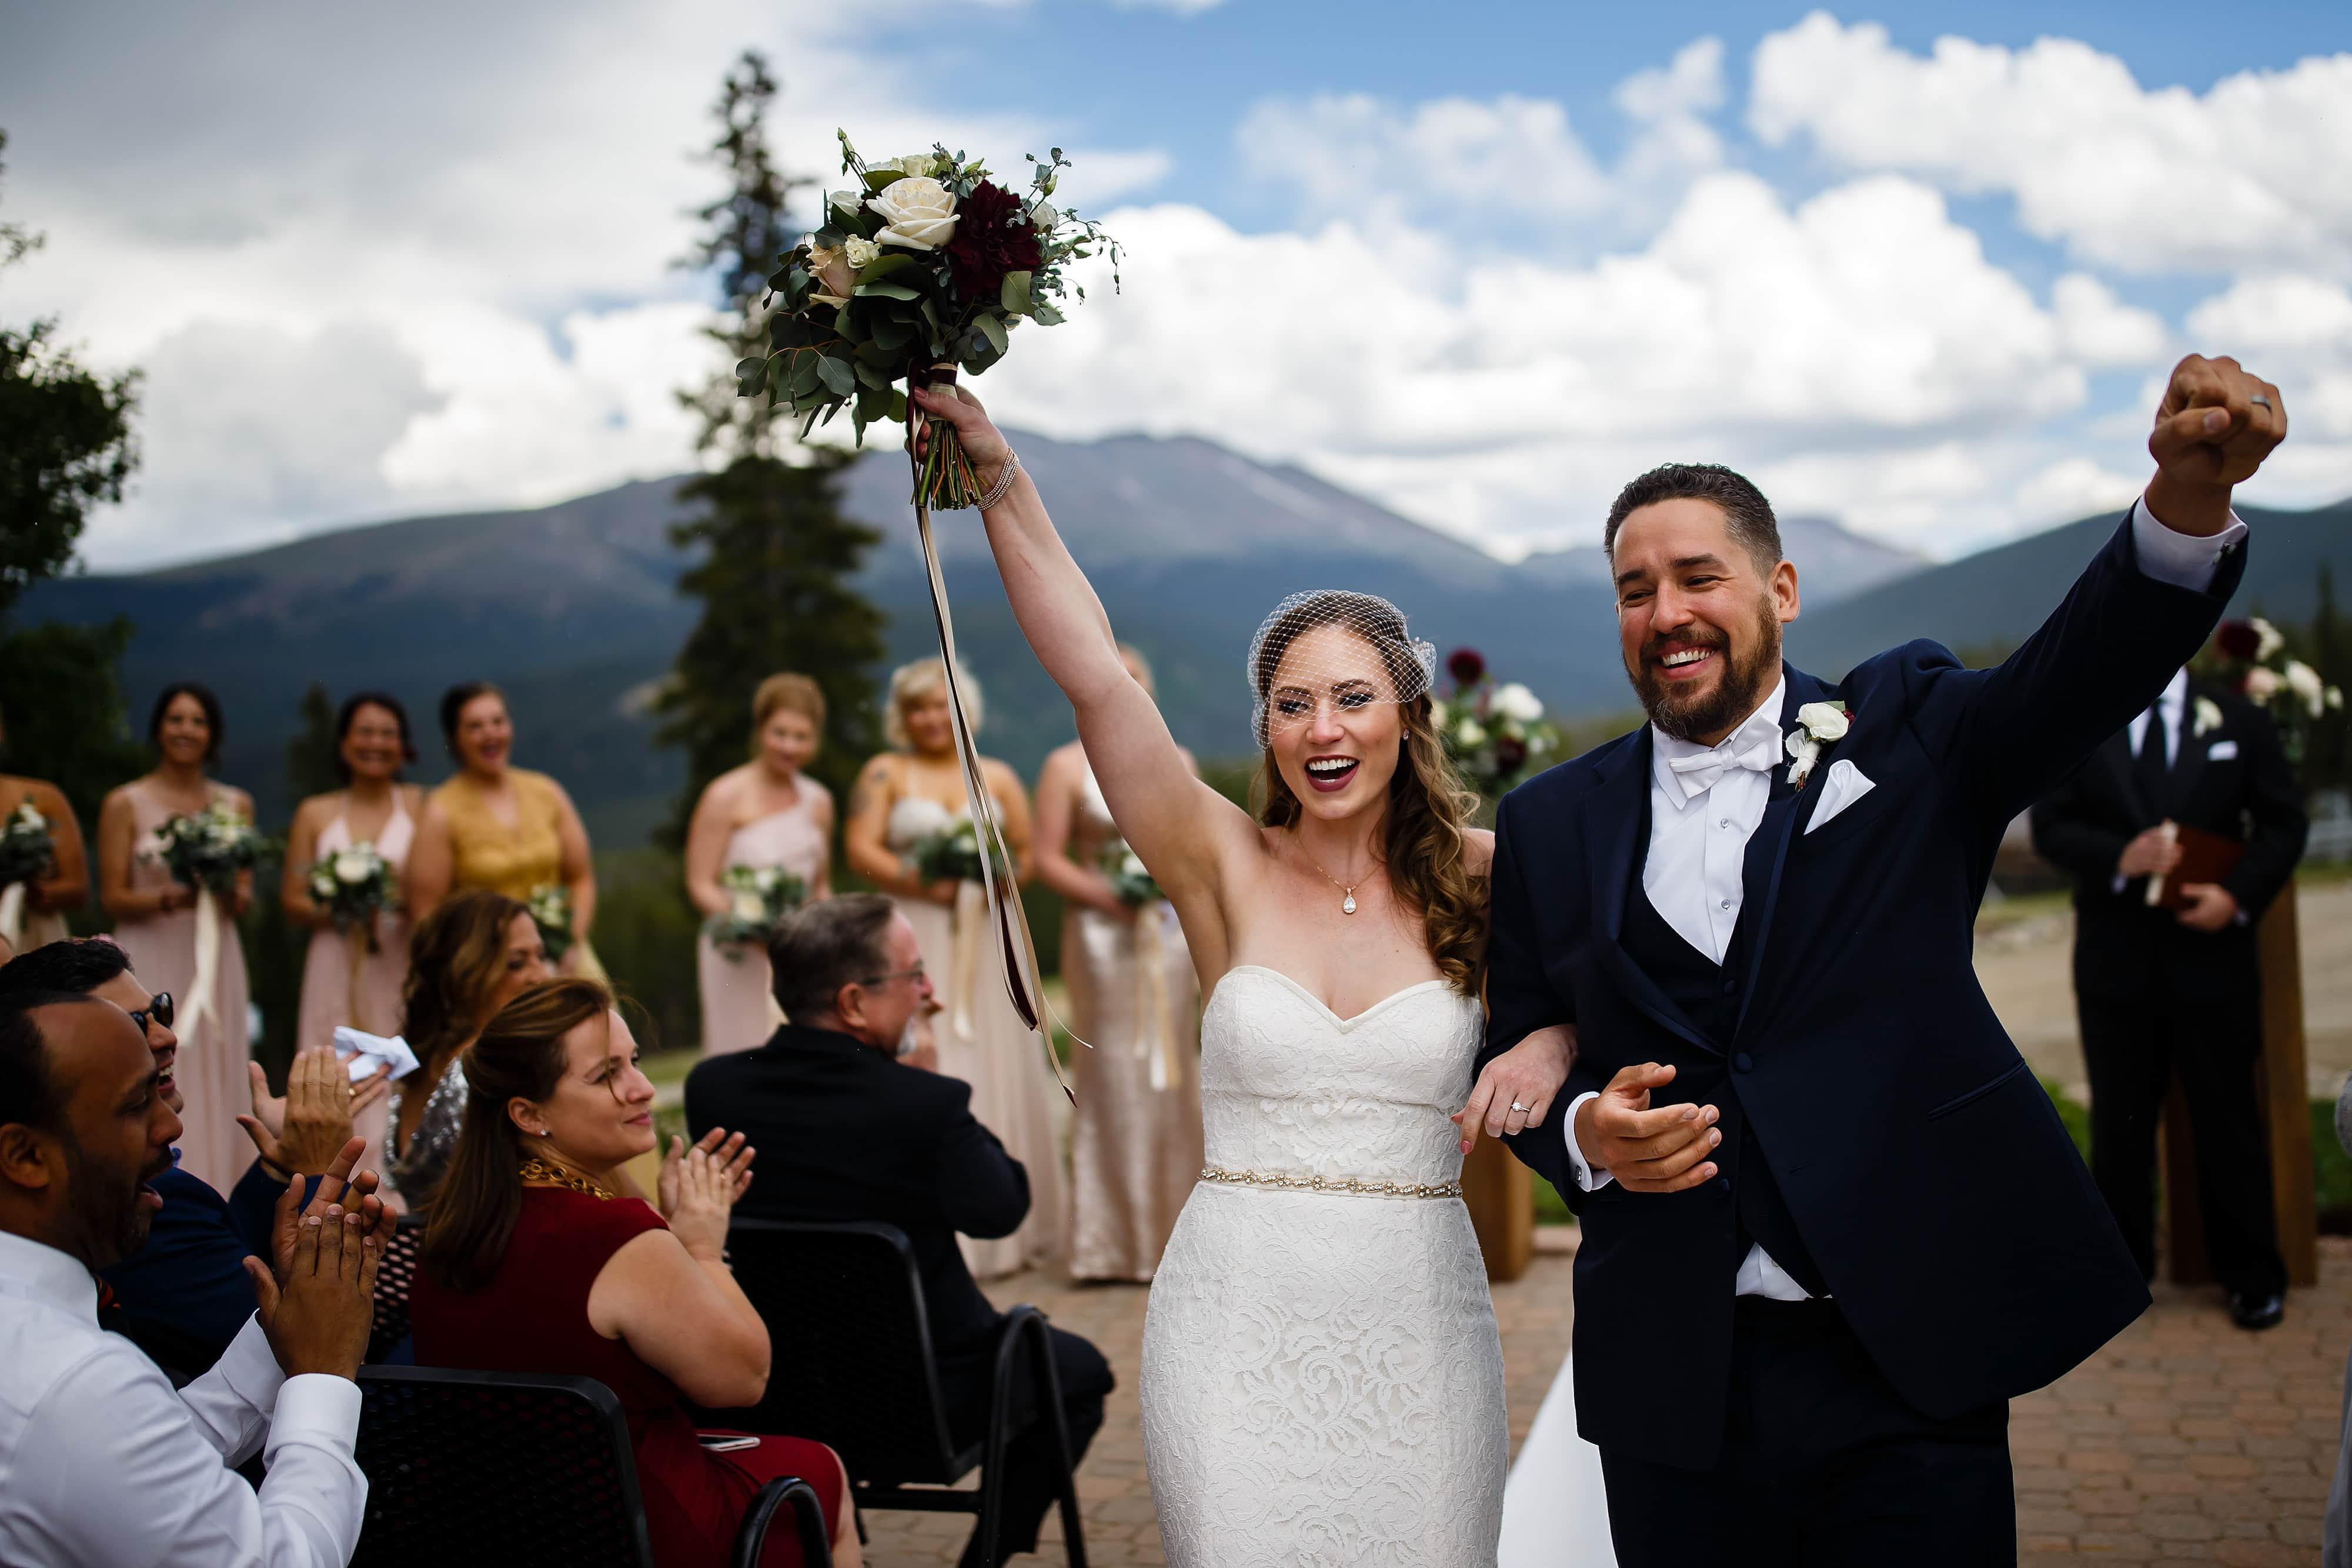 TenMile Station Wedding in Breckenridge | Sharon & Nick